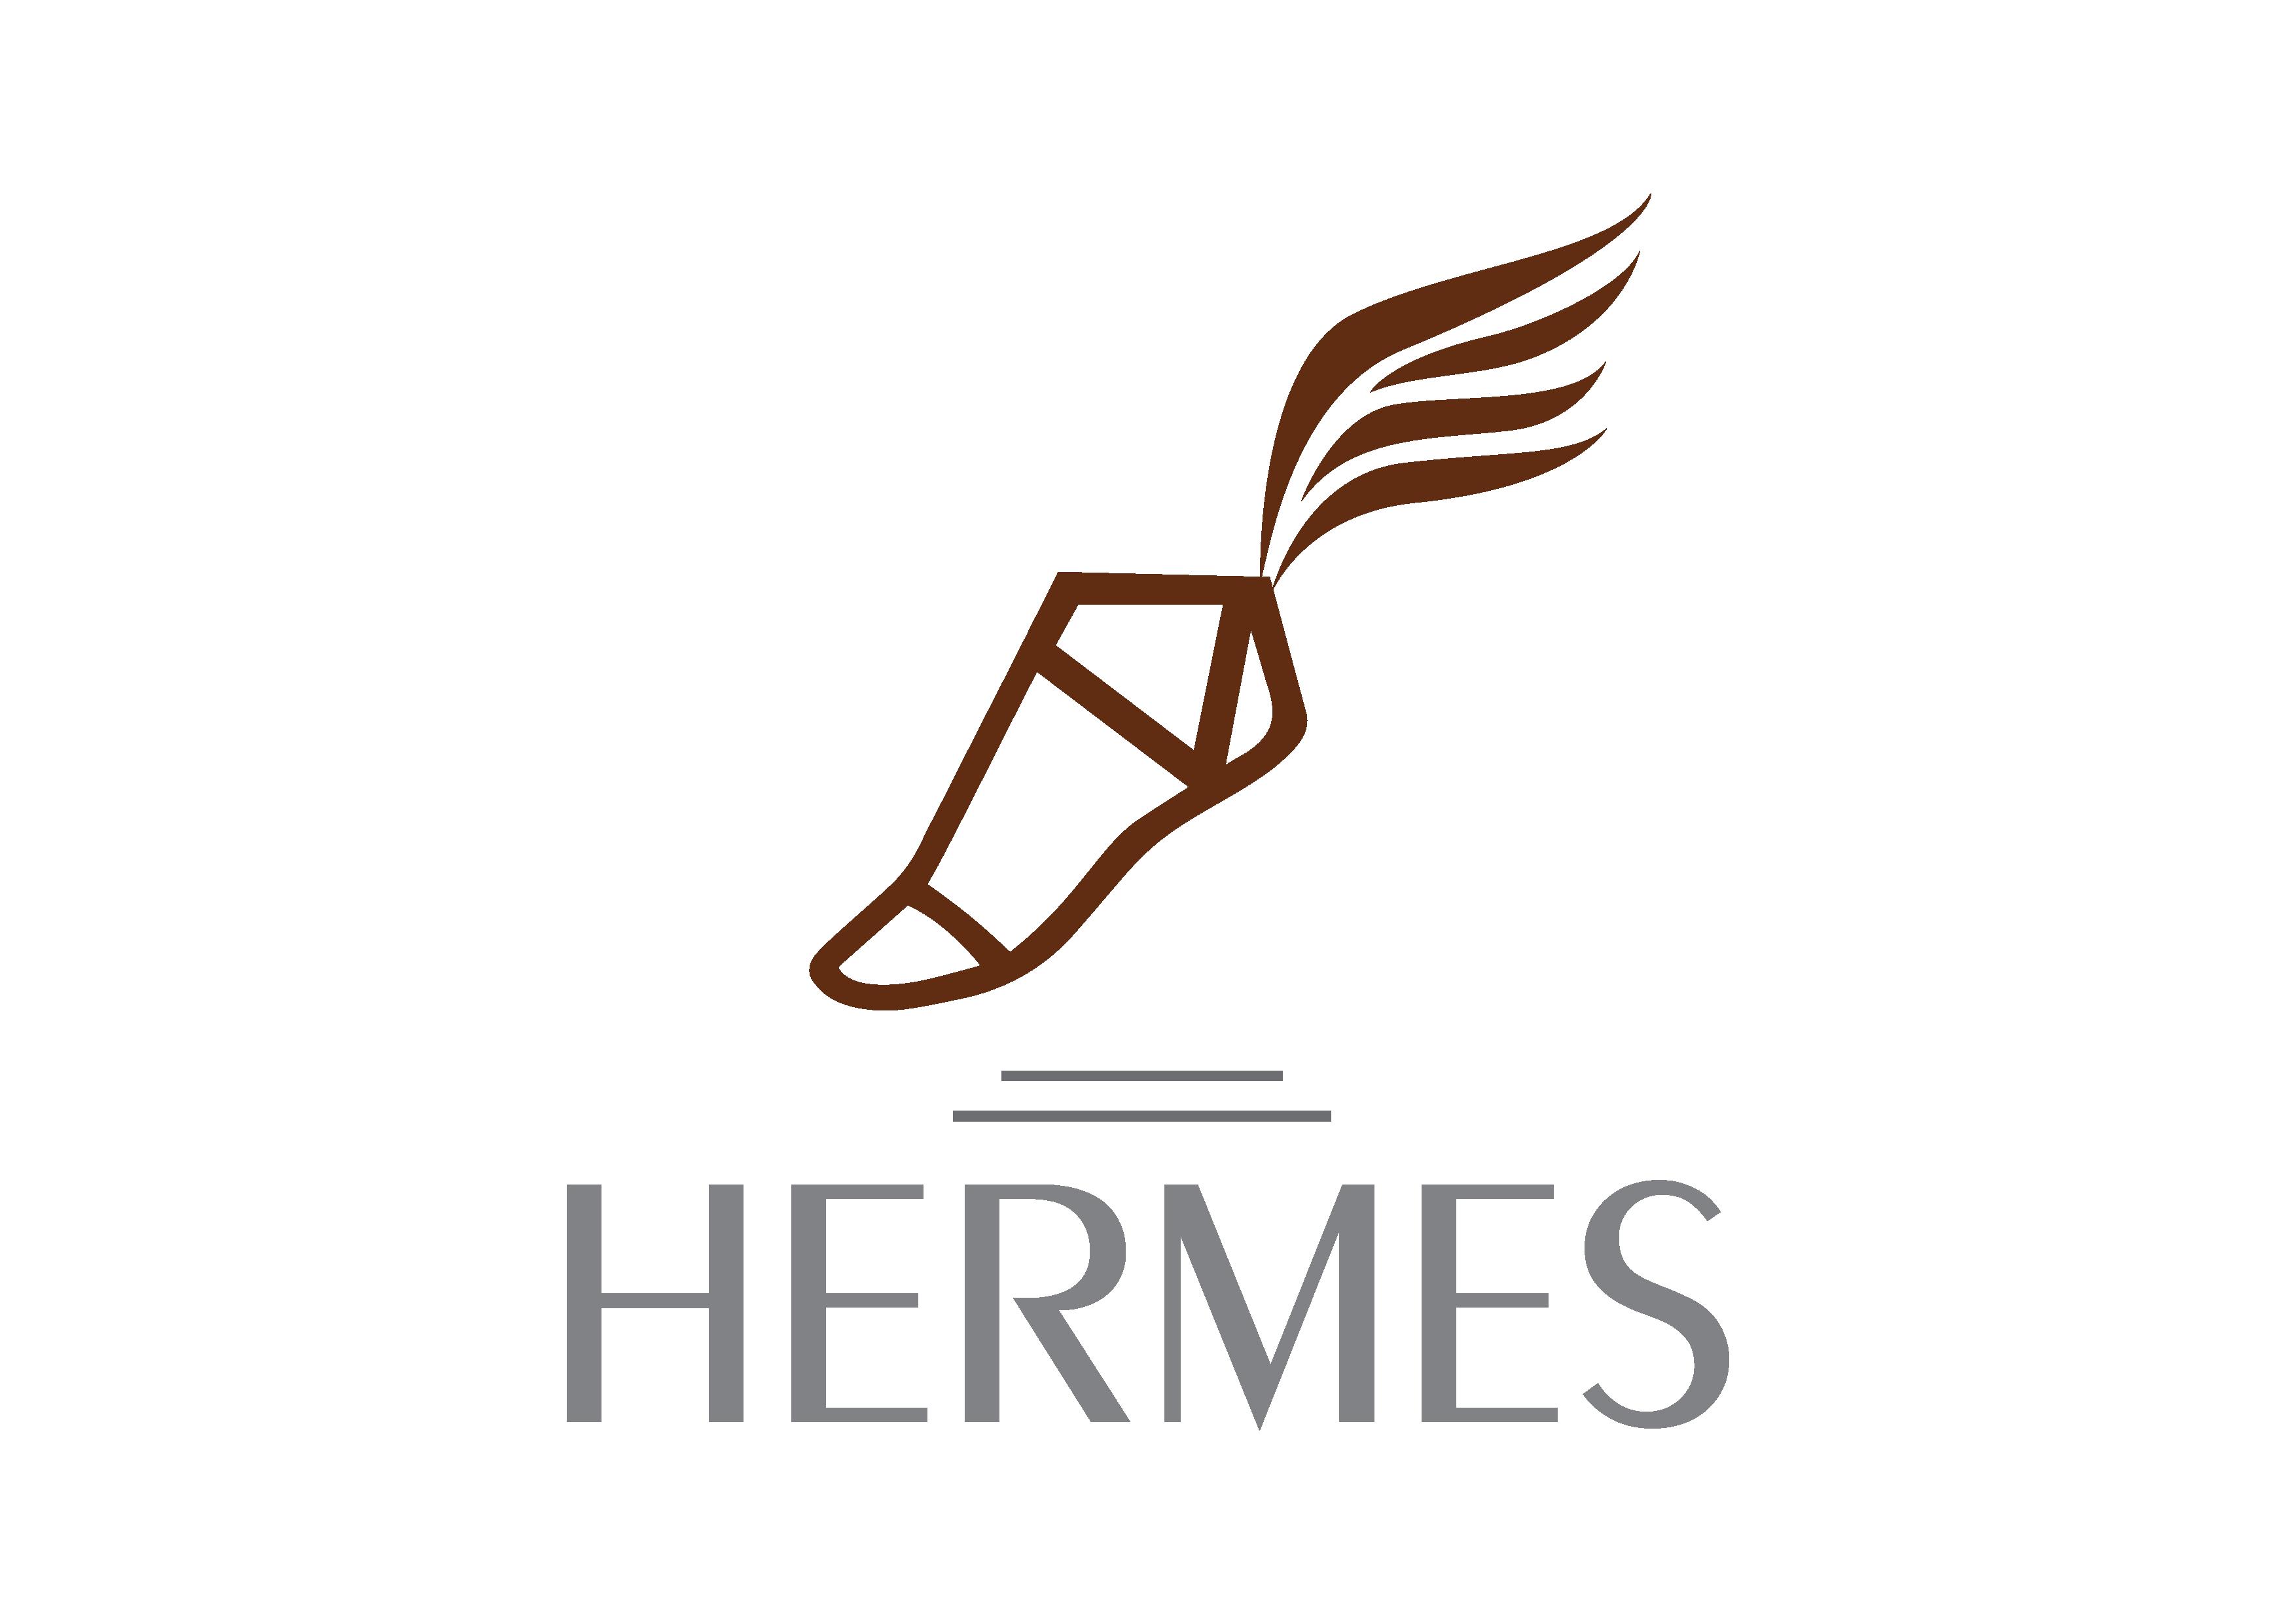 Hermes PNG-PlusPNG.com-3508 - Hermes PNG